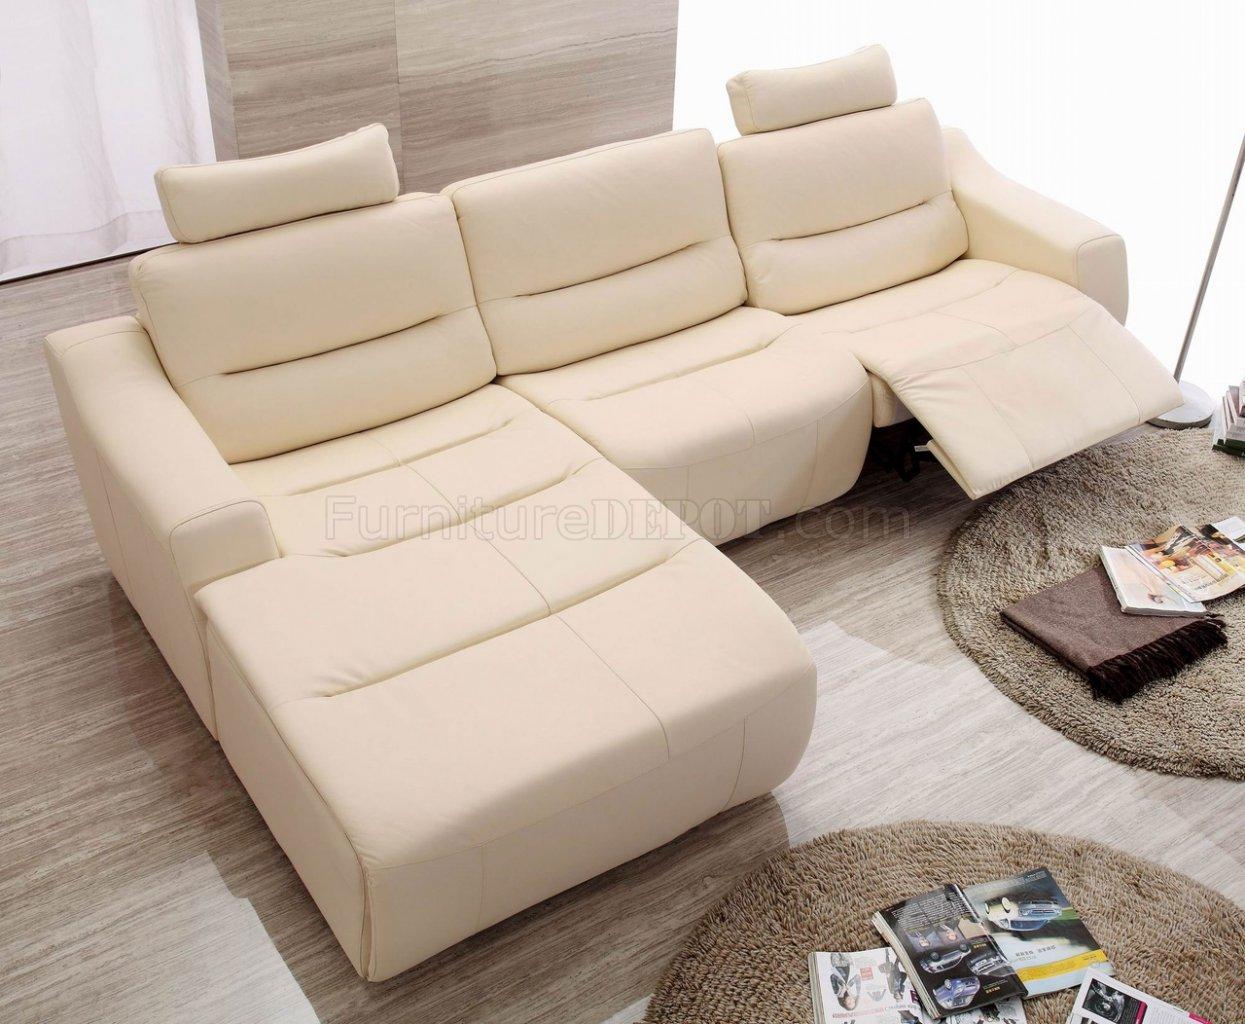 t35 mini modern white leather sectional sofa mor furniture sofas off t 35